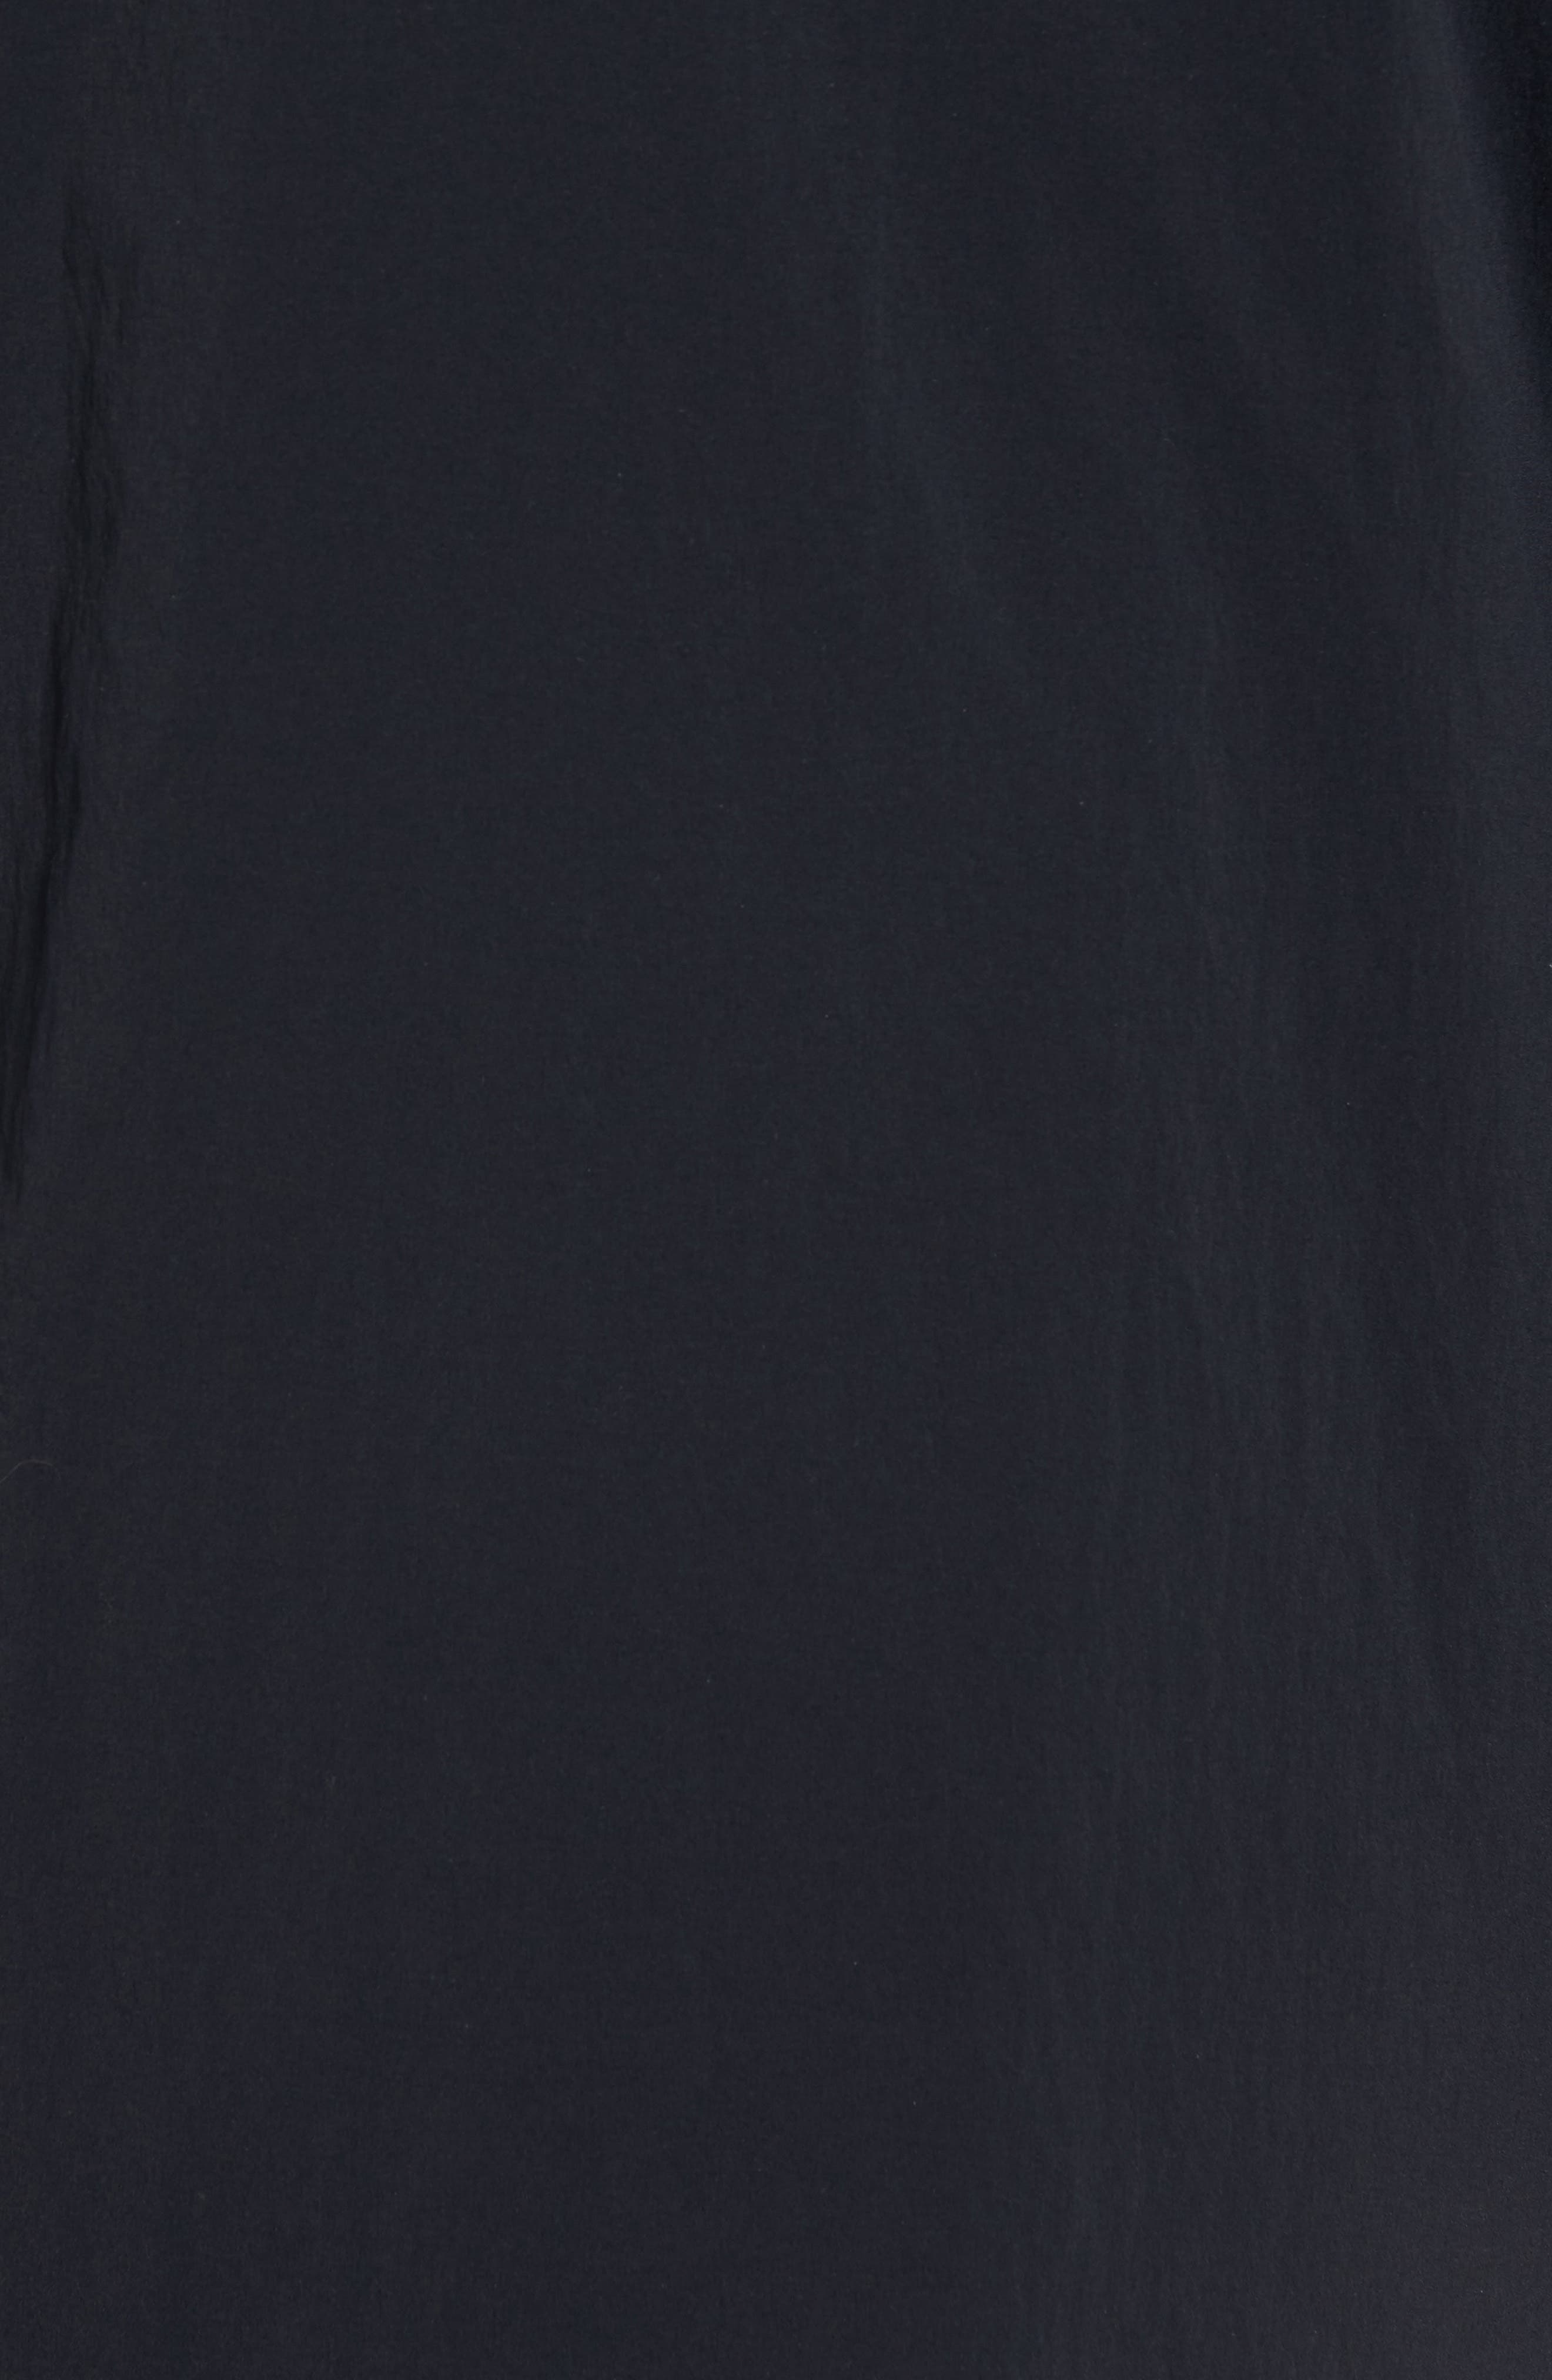 Insulated Trim Sideline Jacket,                             Alternate thumbnail 6, color,                             001